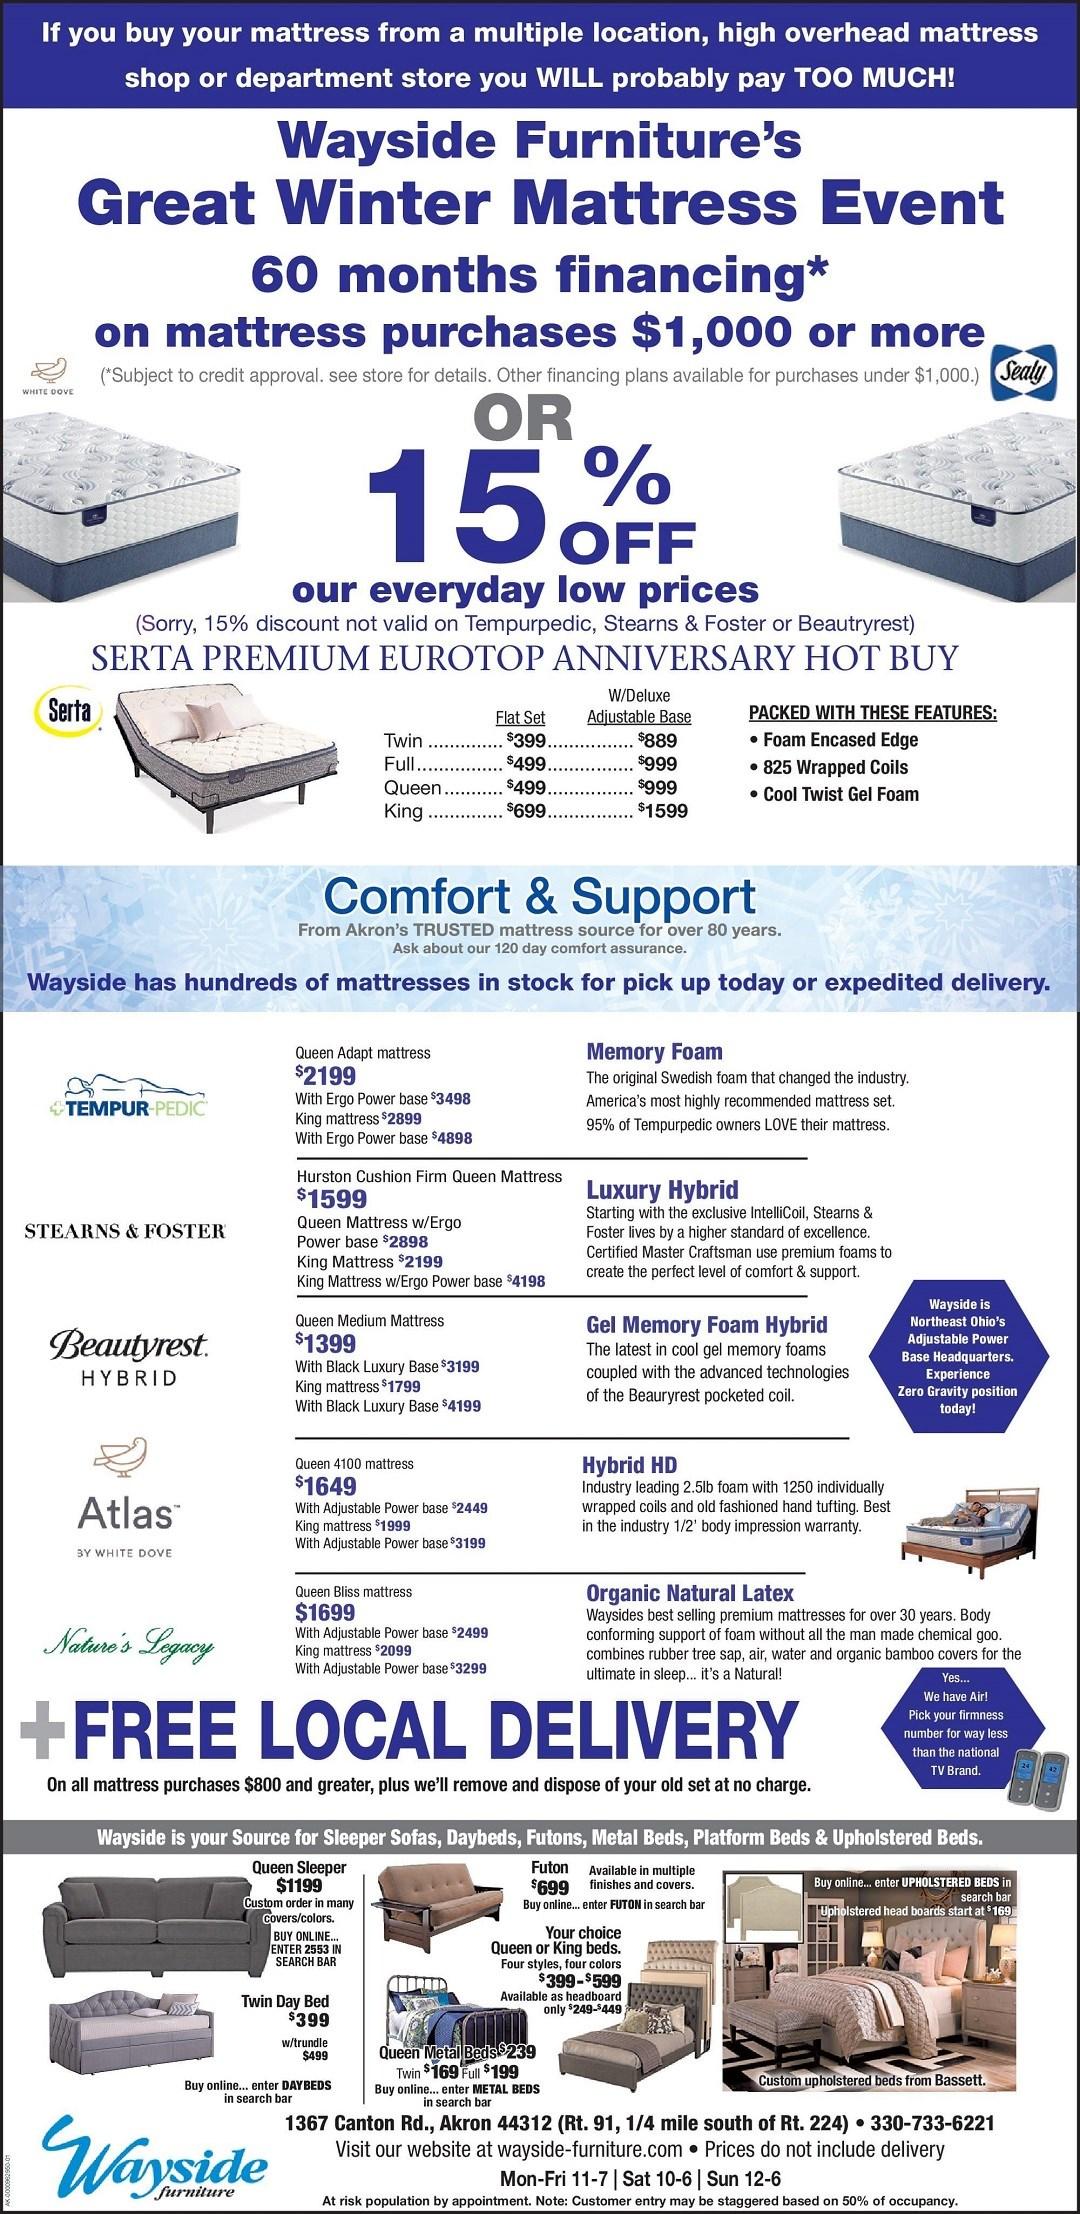 Wayside Furniture's Great Winter Mattress Event